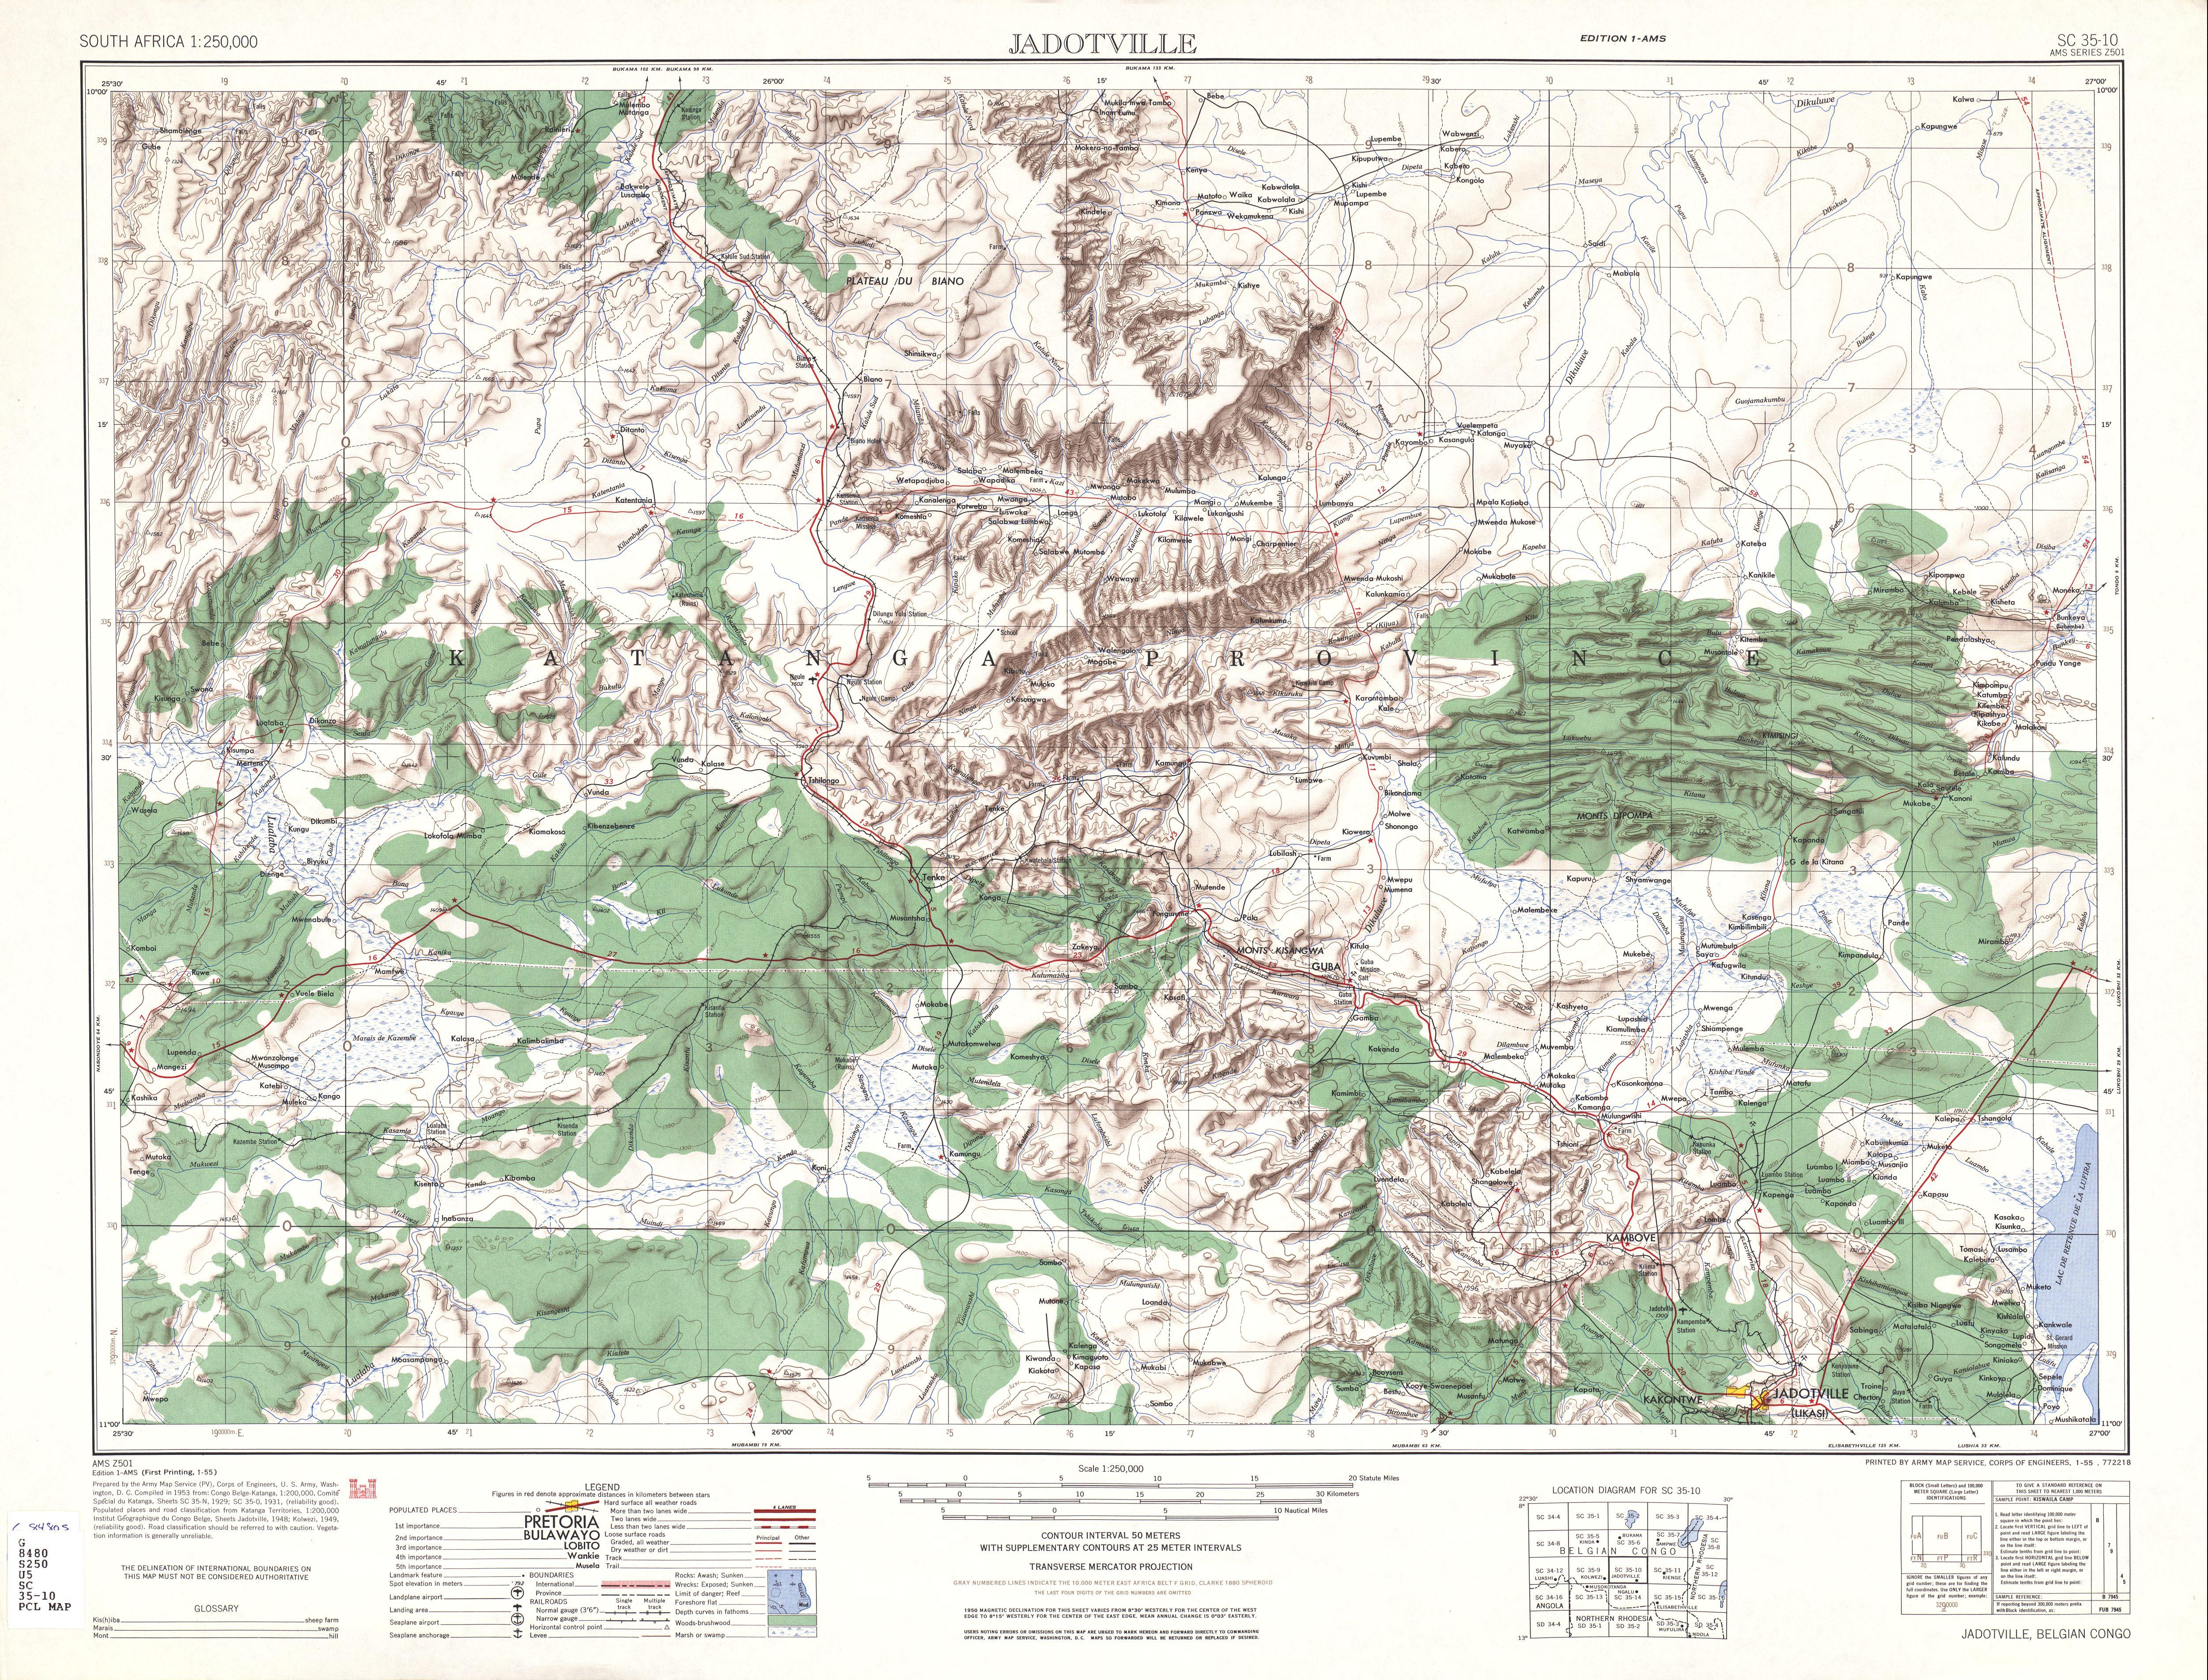 Hoja Jadotville del Mapa Topográfico de África Meridional 1954